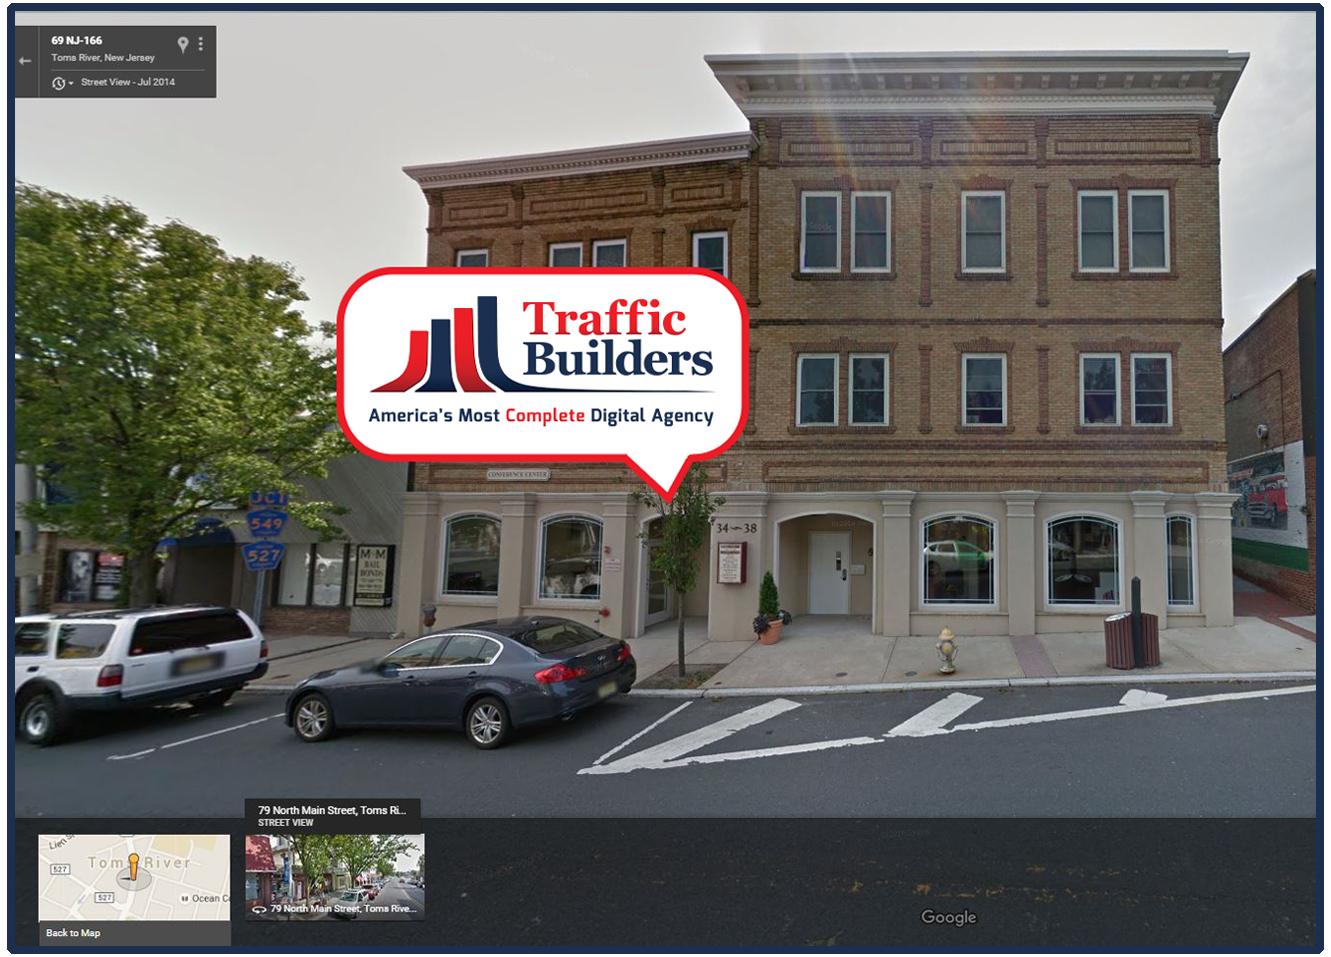 Traffic Builders Digital Marketing Agency image 1